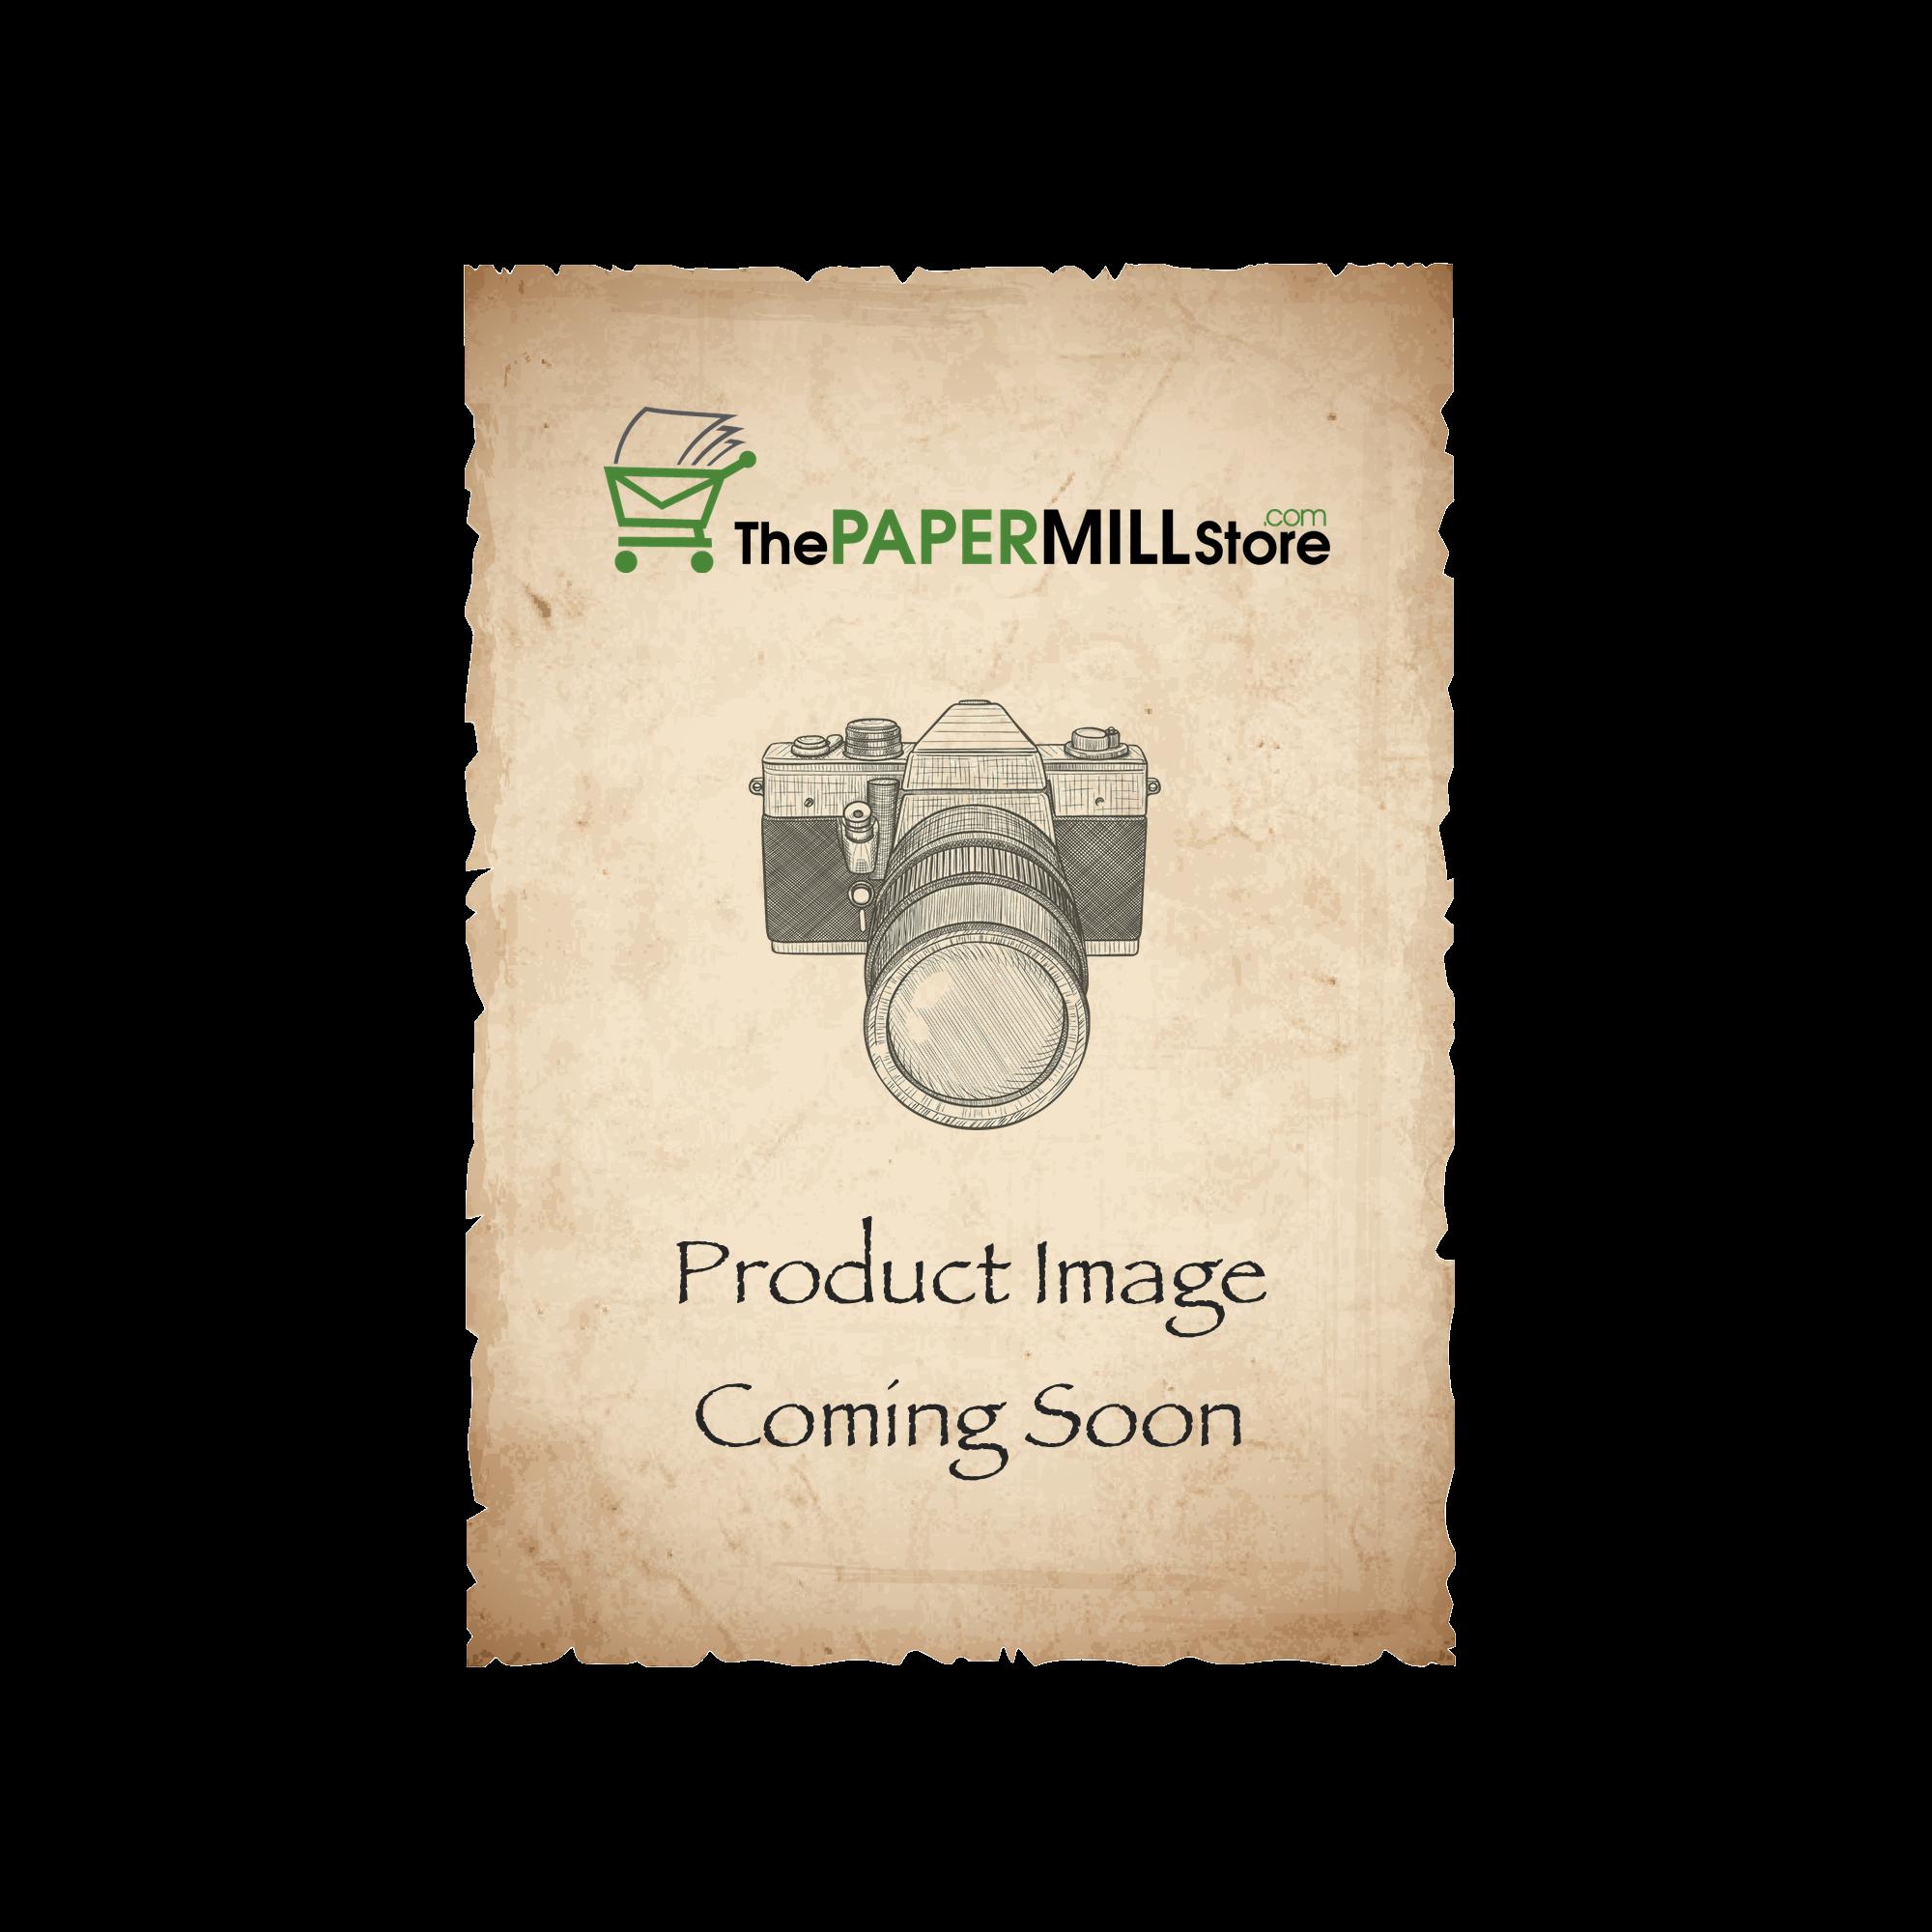 Splendorlux Black Paper - 27 1/2 x 39 3/8 in 11.5 pt Cover Pearl C/1S 125 per Package